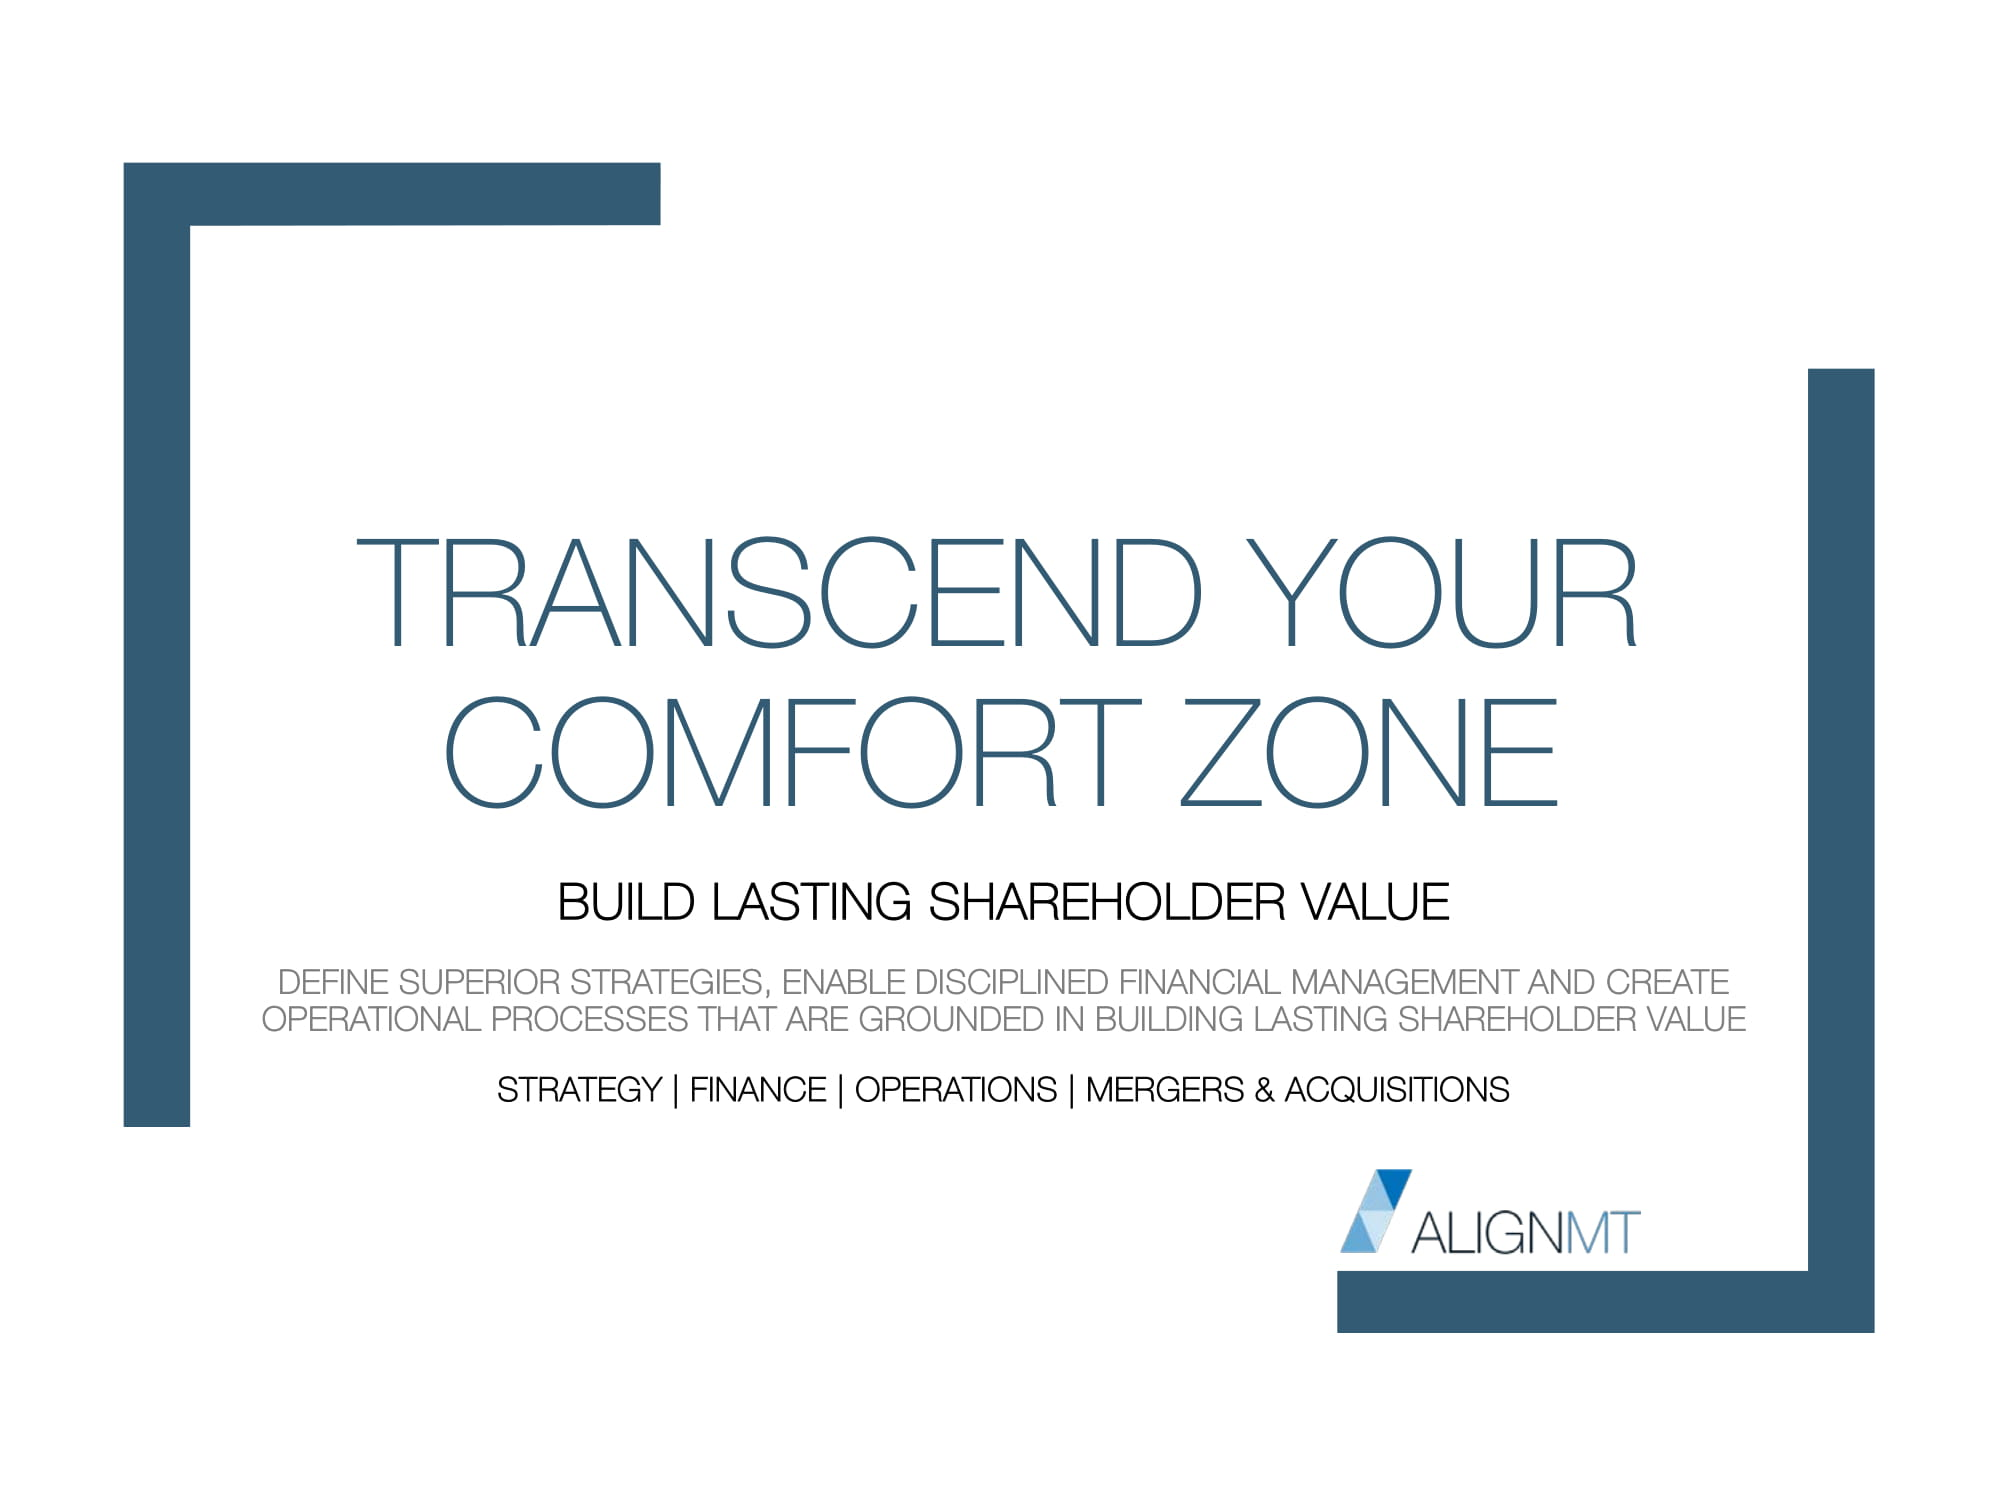 Transcend Your Comfort Zone 2018